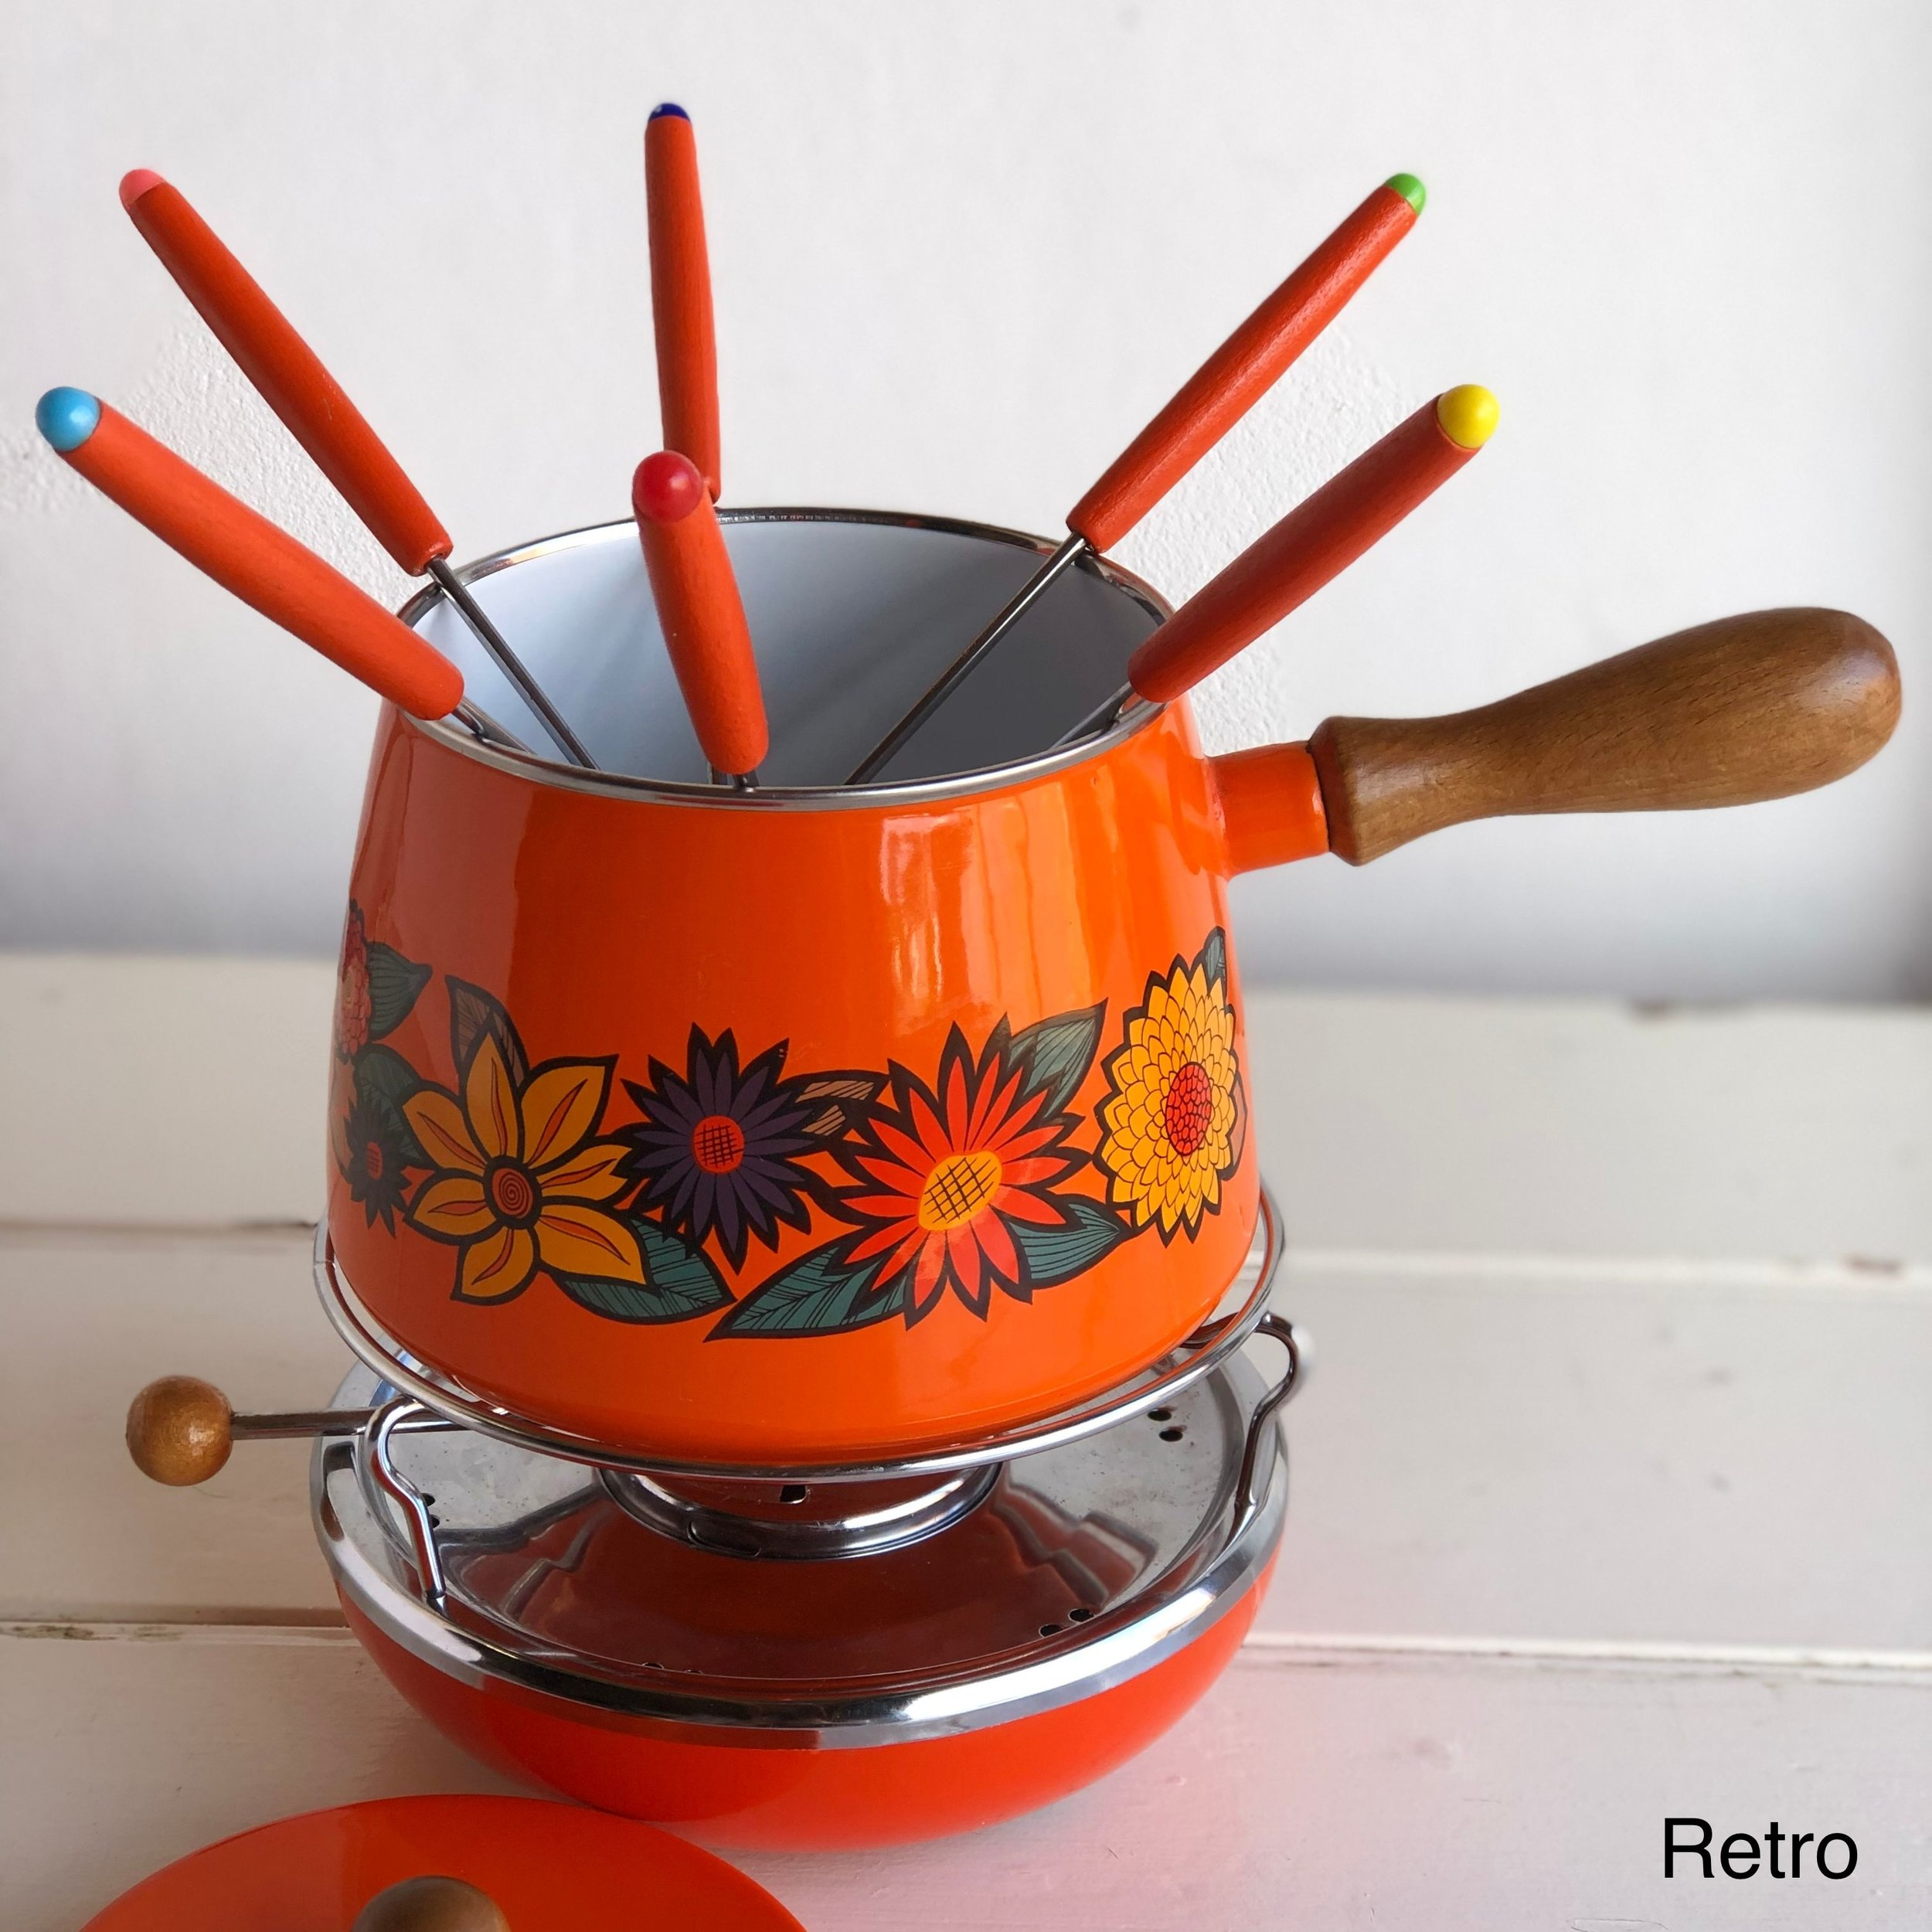 Retro Pot (1) (2).jpg